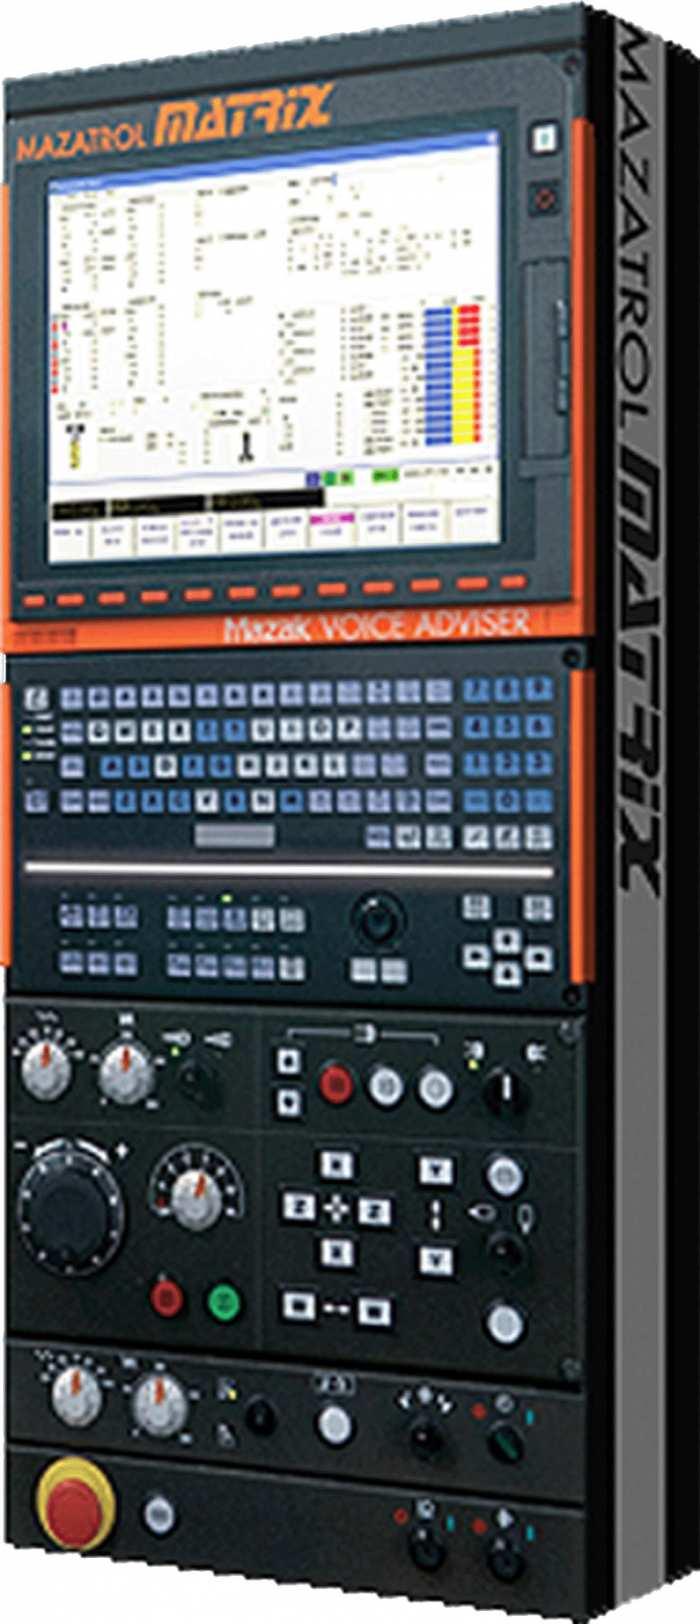 Programming Manual Mazatrol Matrix Nexus 2